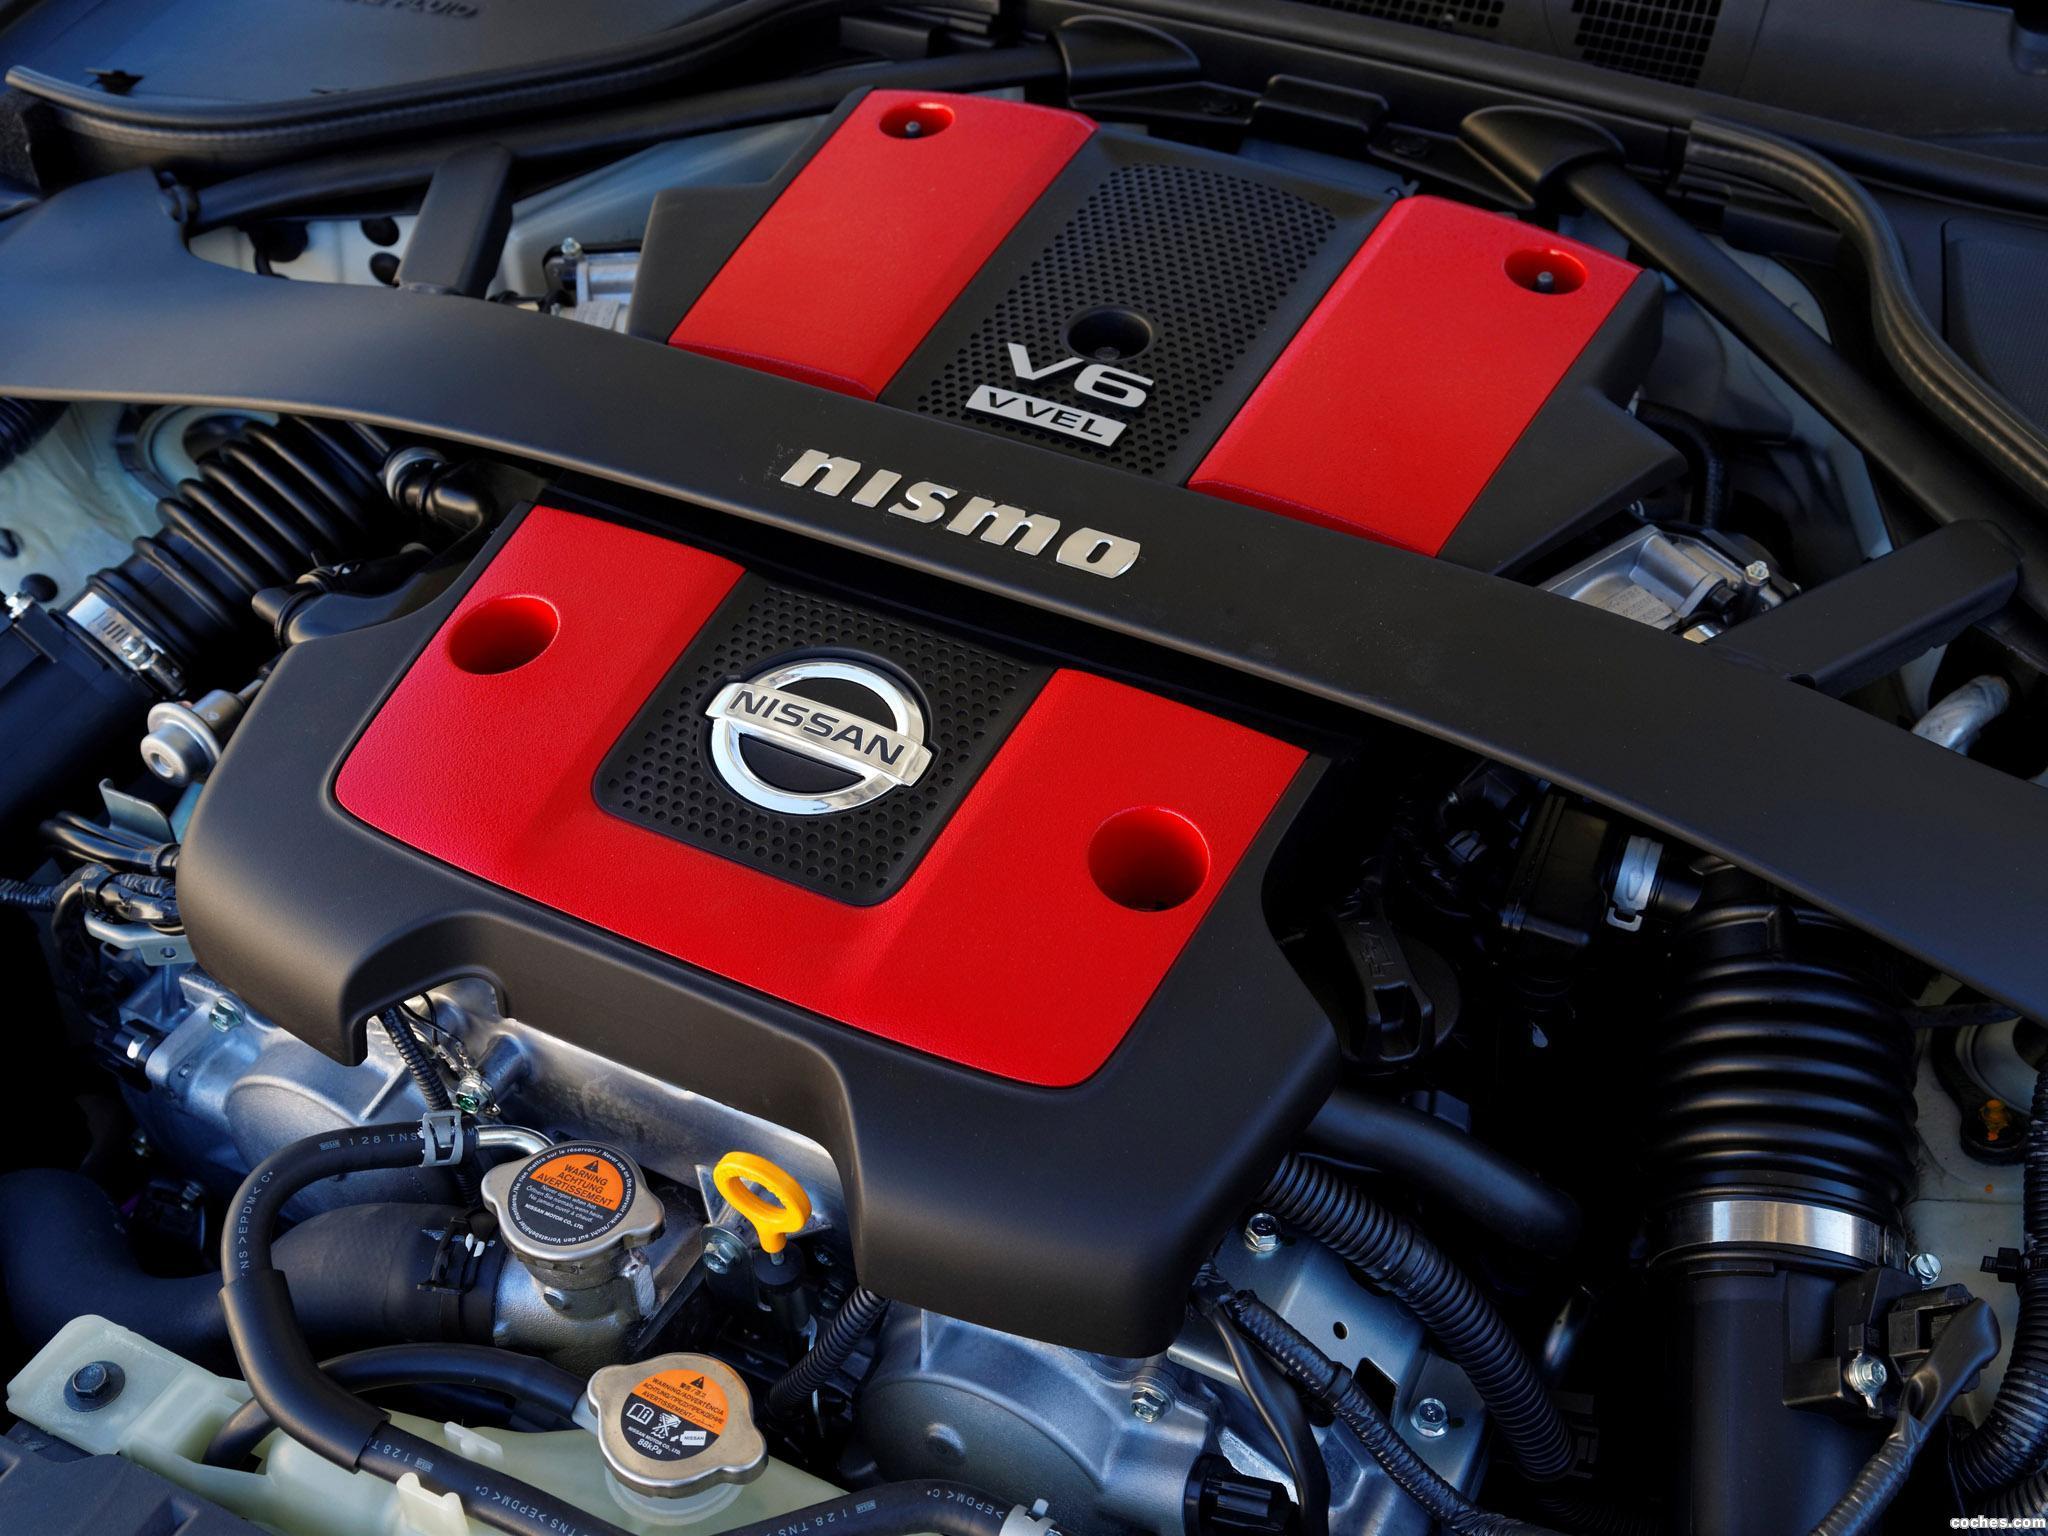 Foto 4 de Nissan Nissan 370Z Nismo 2013